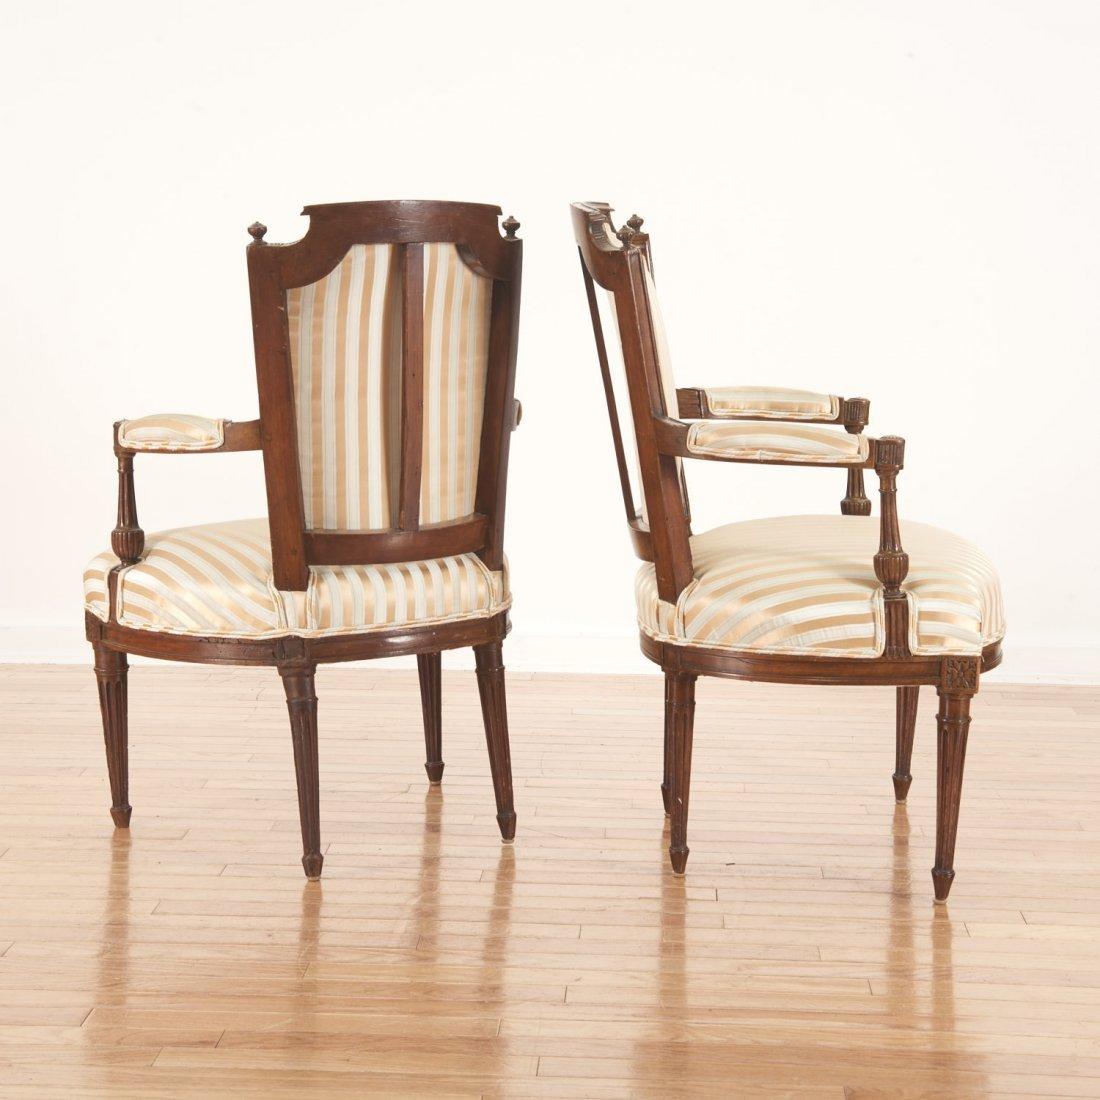 Pr Directoire silk upholstered mahogany fauteuils - 4